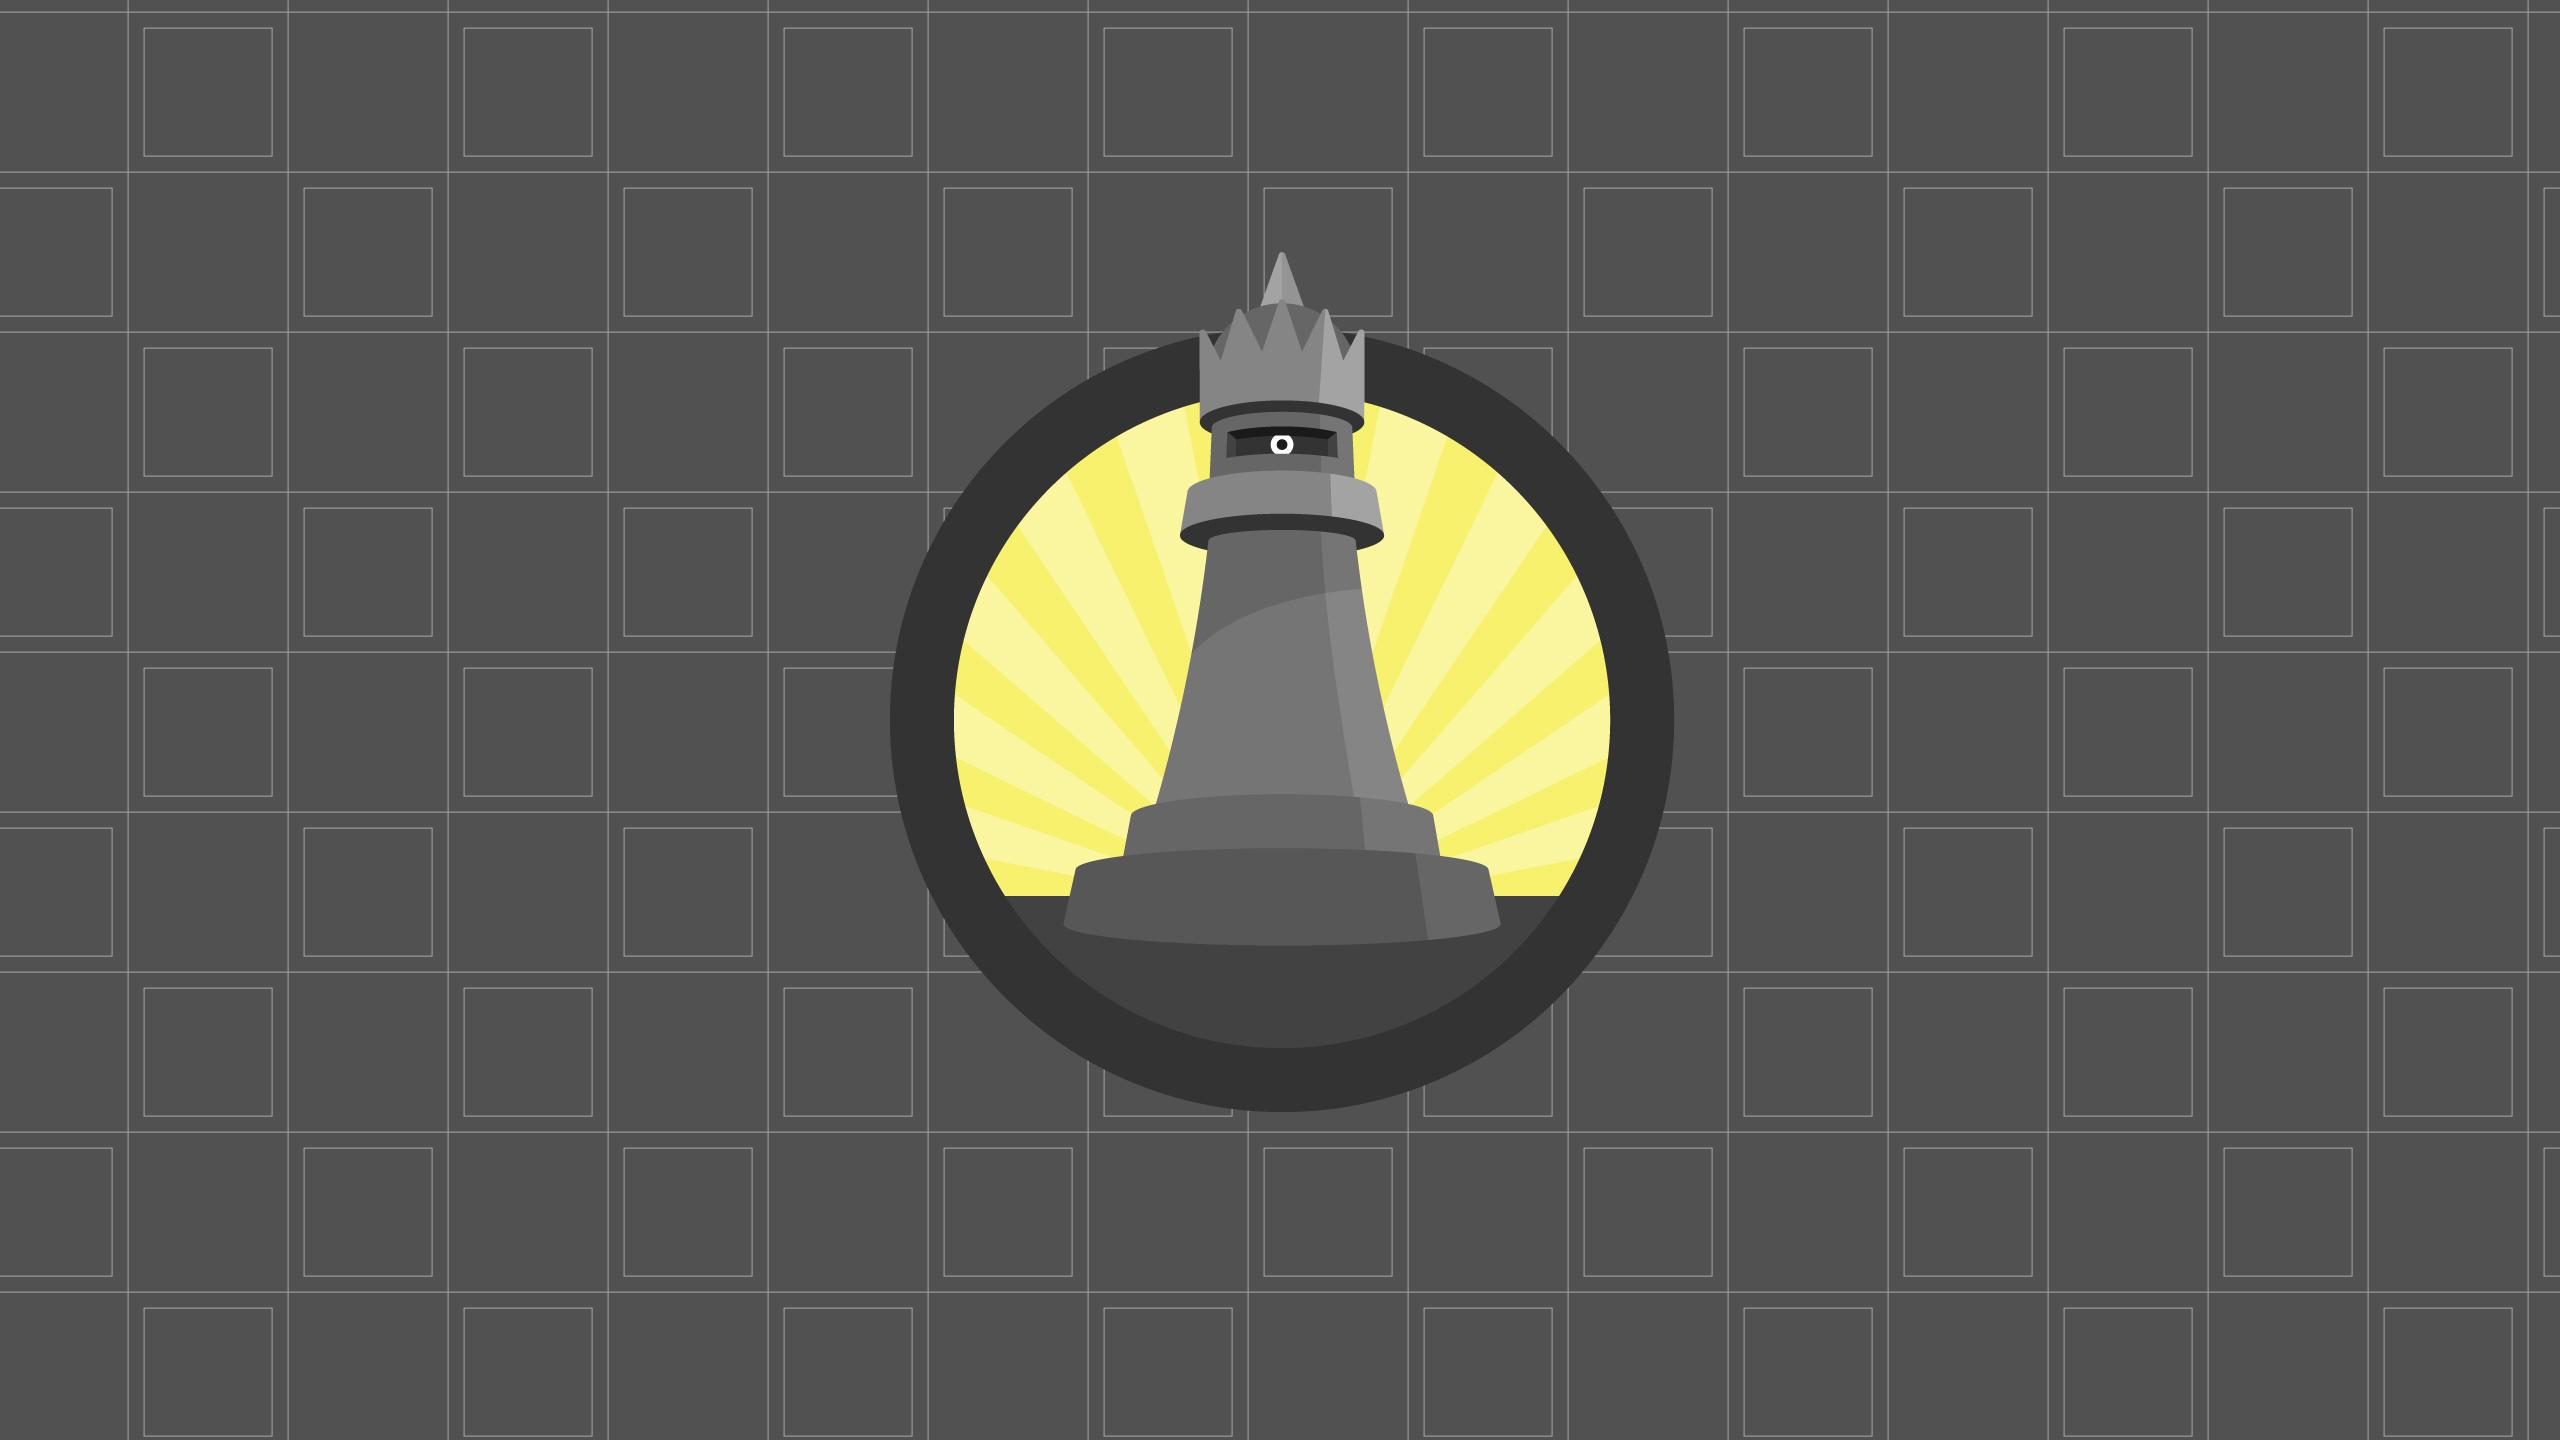 Final Mastermind Level badge and background